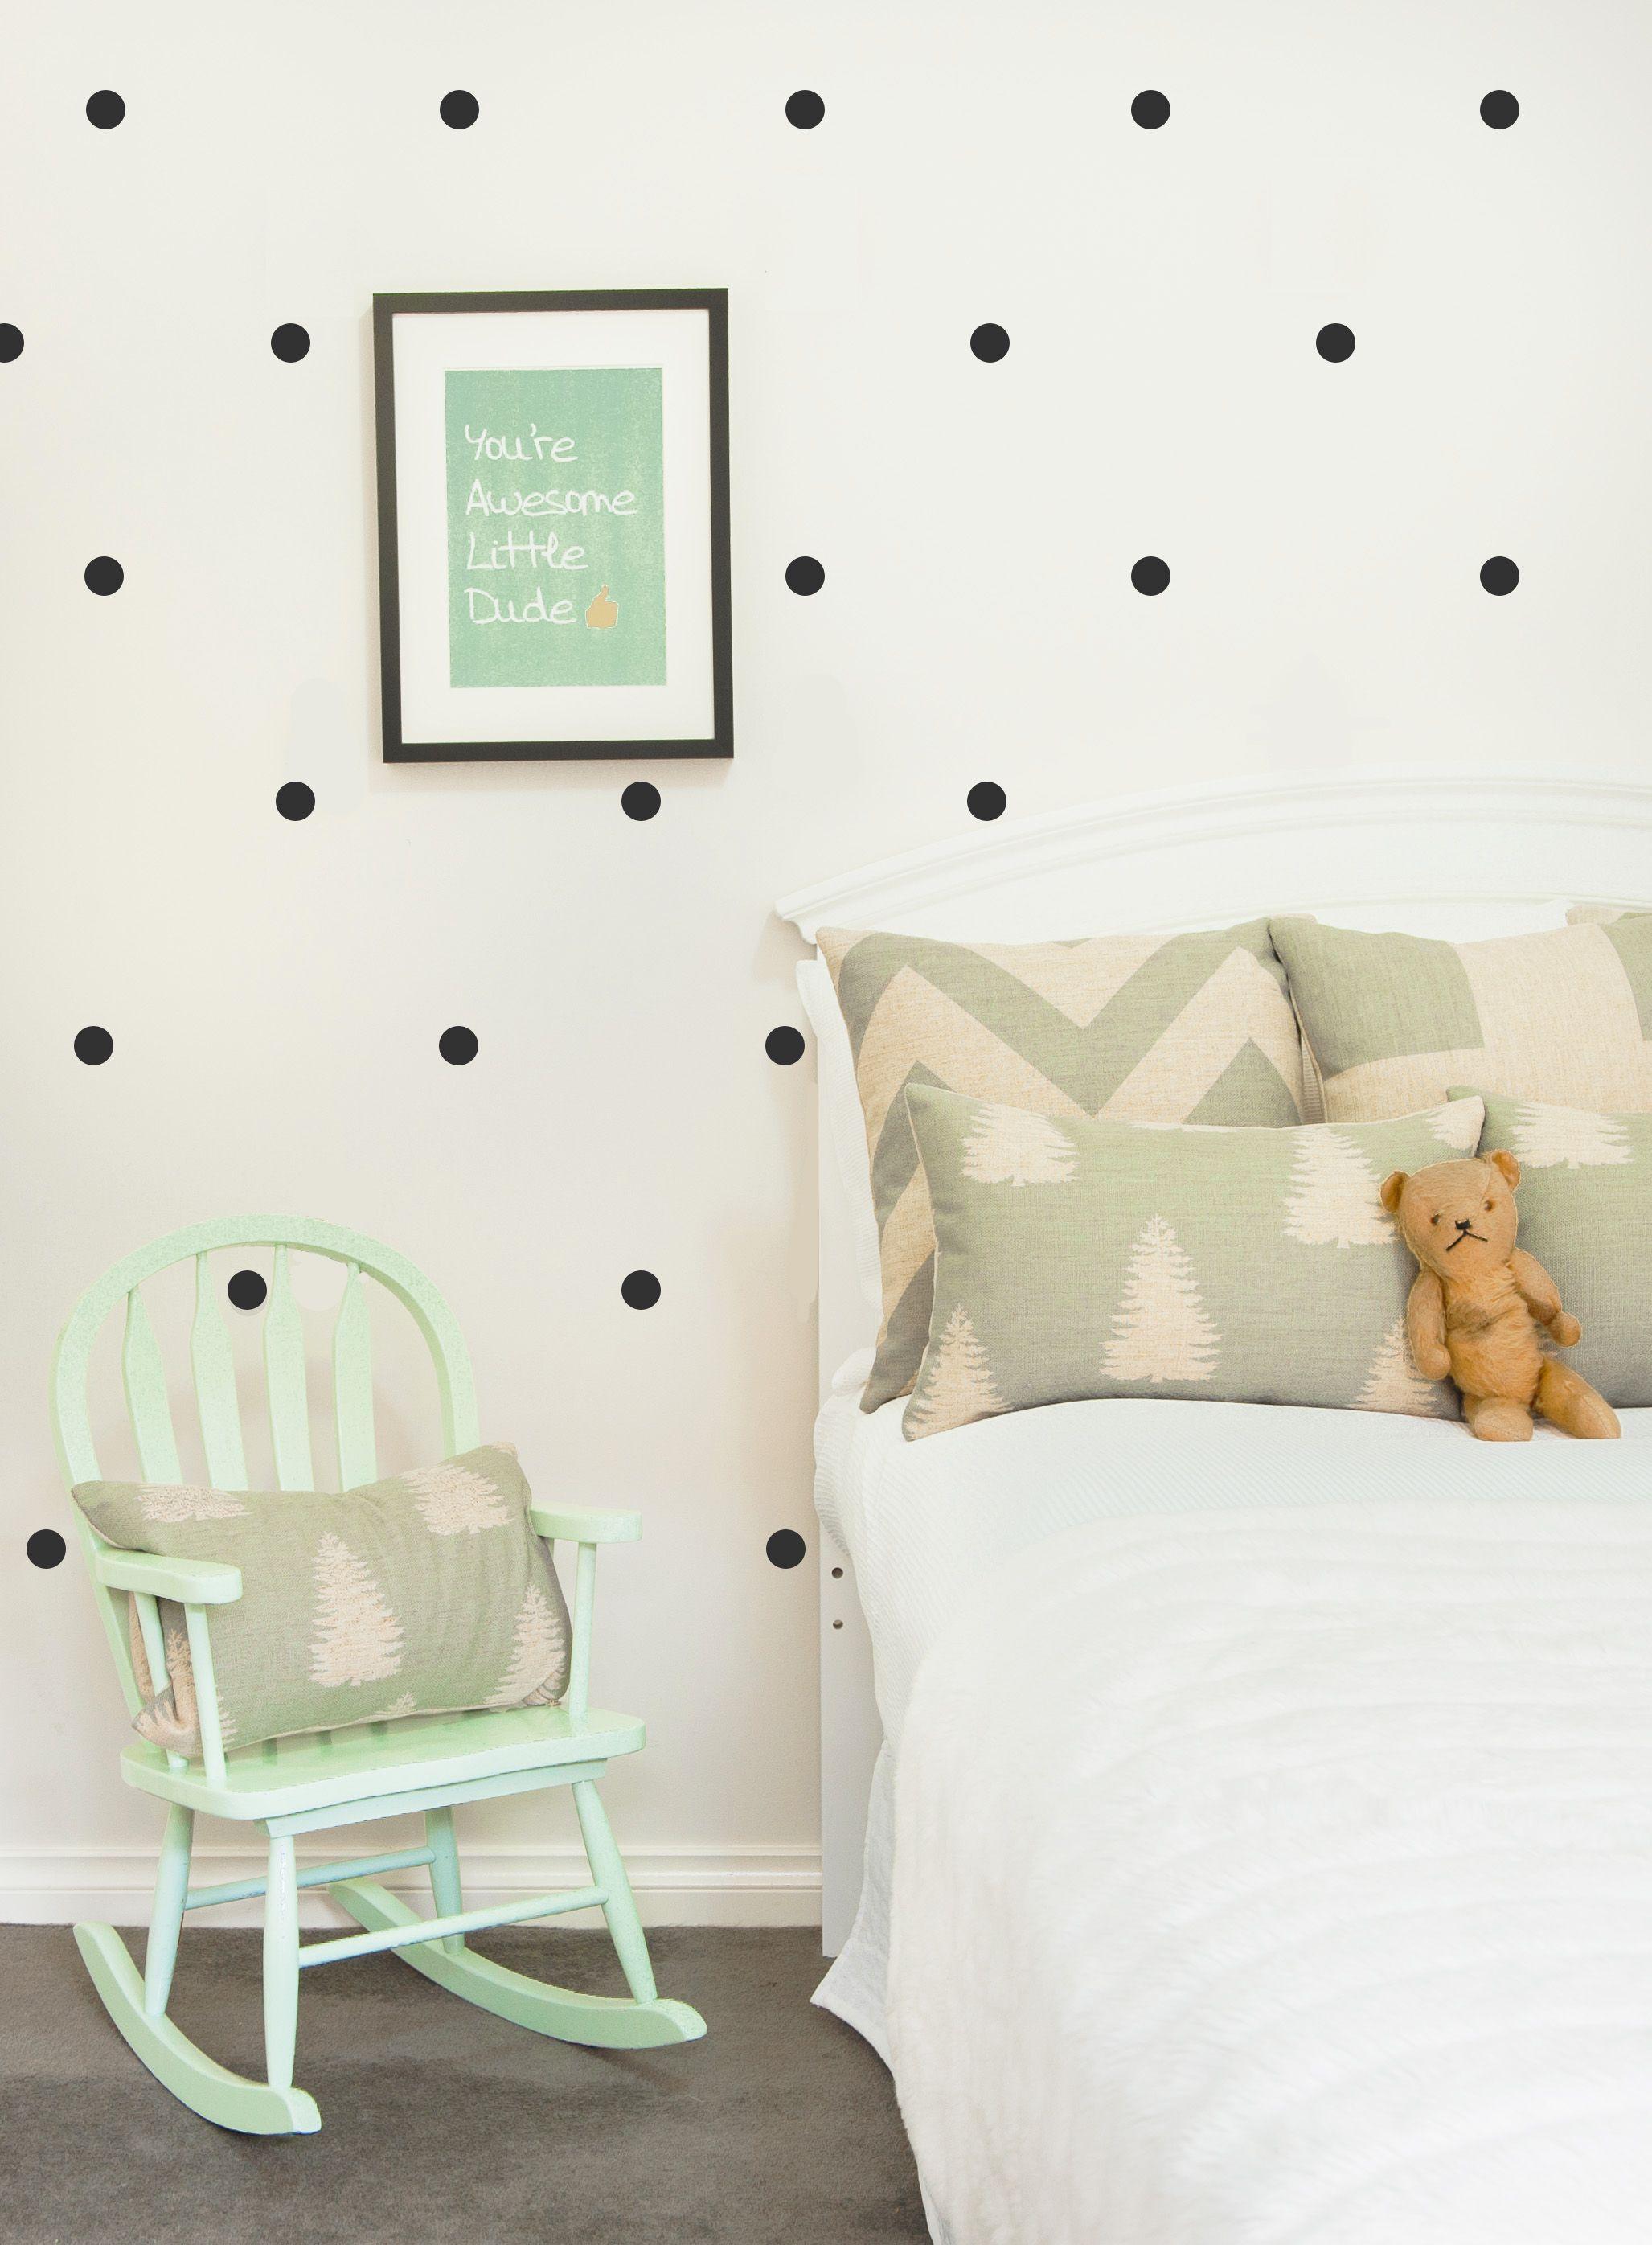 Spot vinyl Stickers Decal Mural 20 x Polka Dots Crafting Wall Mirror Window